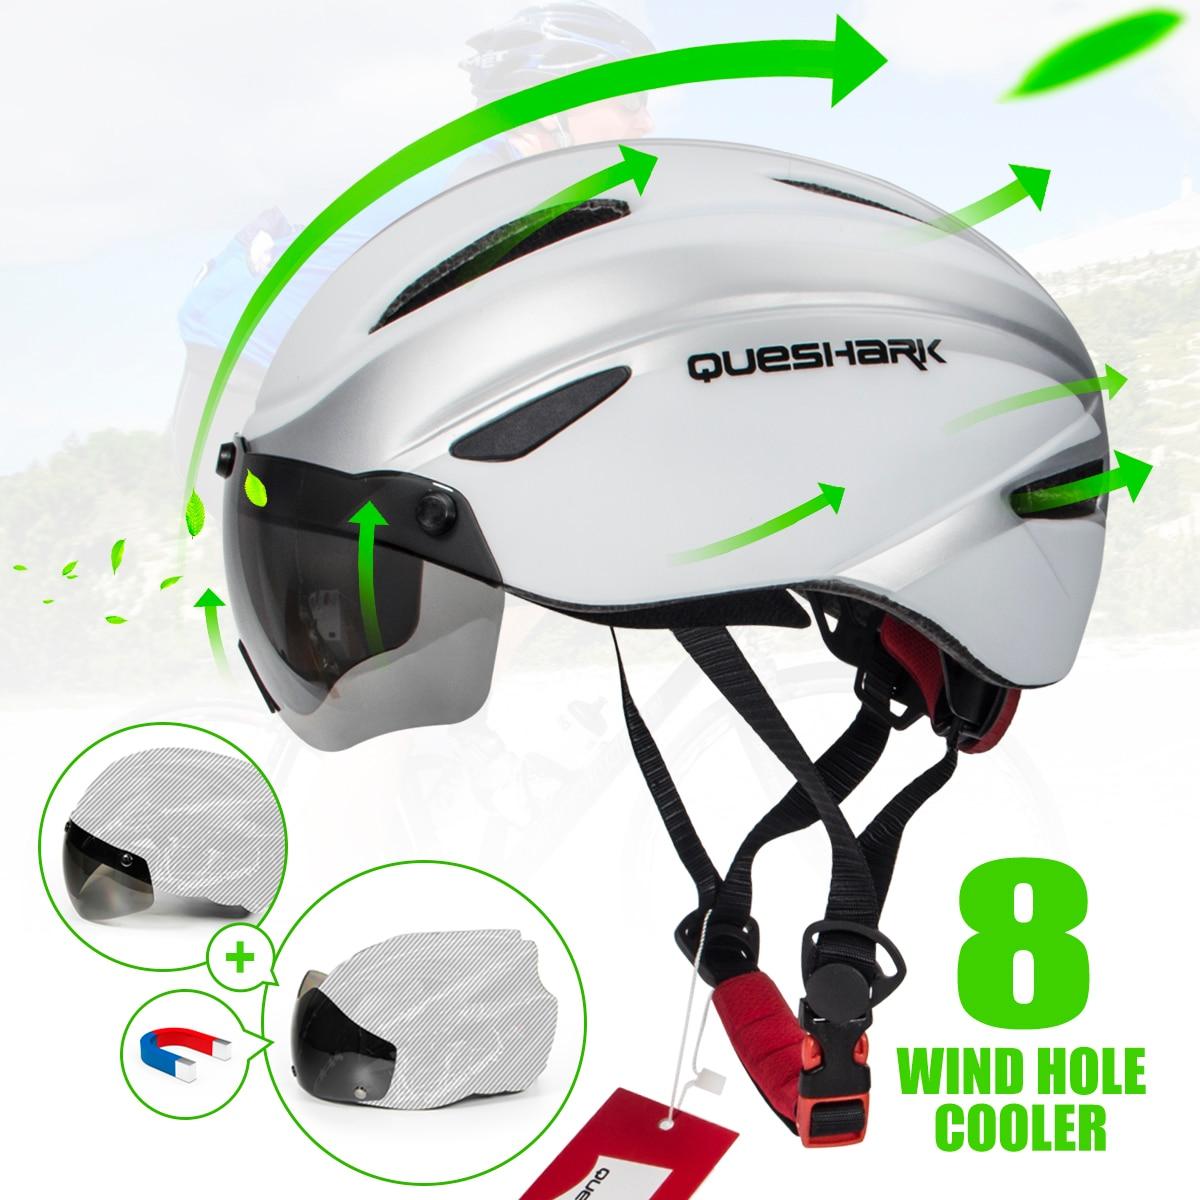 QUESHARK Bicycle Helmet Riding Caps Road MTB Cycling Helmet With Goggles Night